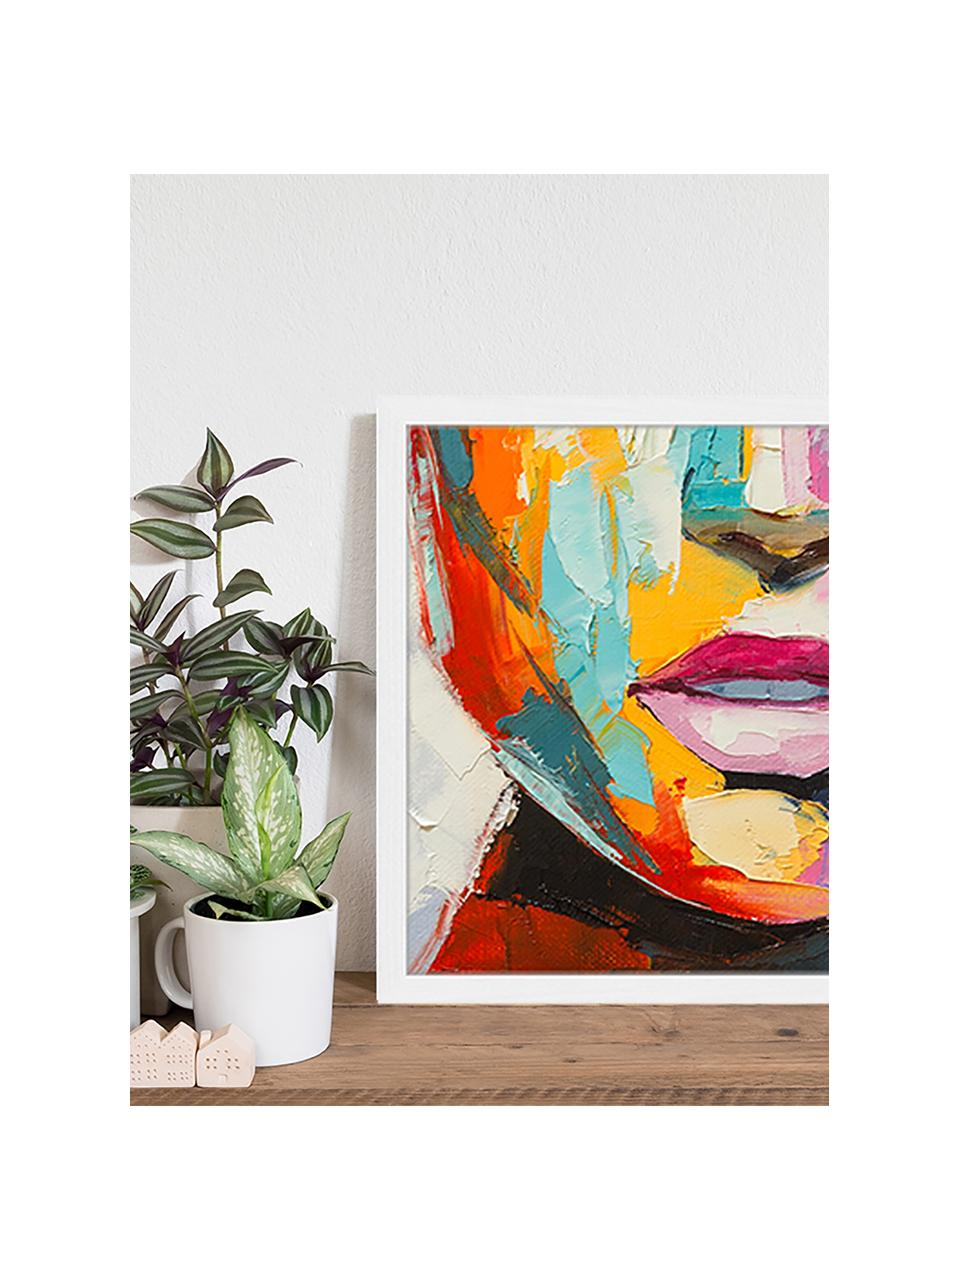 Stampa digitale incorniciata Colorful Emotions, Immagine: stampa digitale su carta,, Cornice: legno verniciato, Multicolore, Larg. 53 x Alt. 43 cm